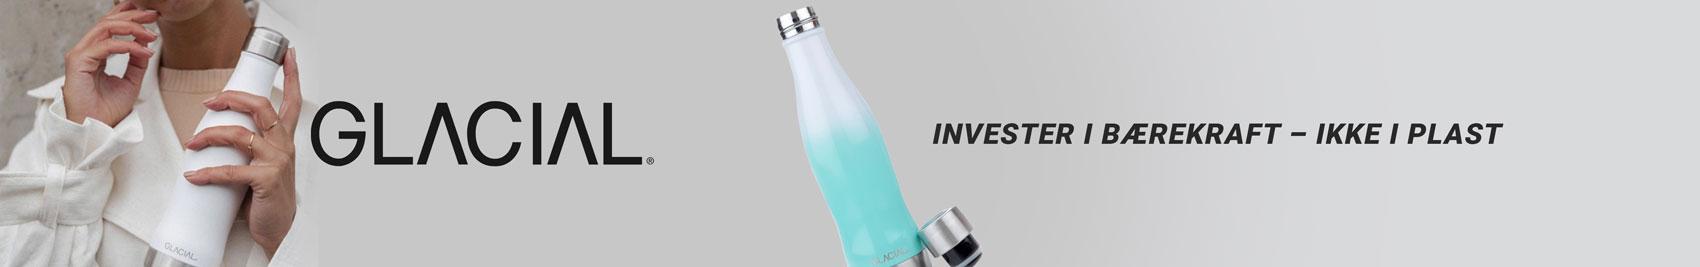 bærekraftighet 3tshop miljøhensyn glacial bottle drikkeflaske